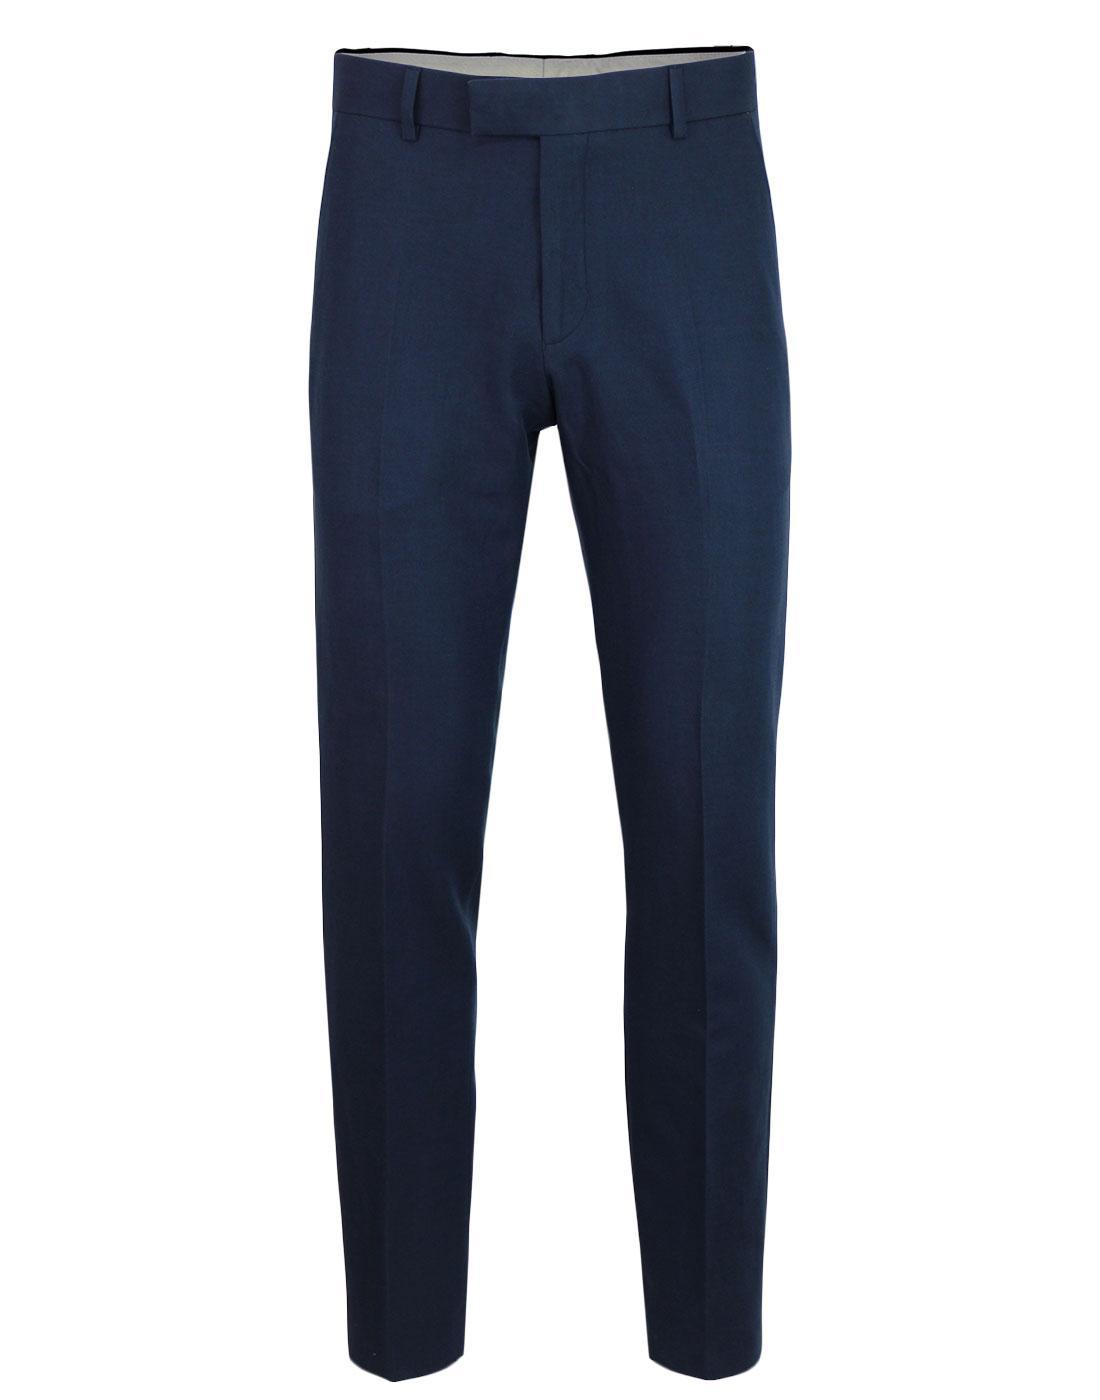 Radisson GIBSON LONDON Smart Plain Trousers NAVY